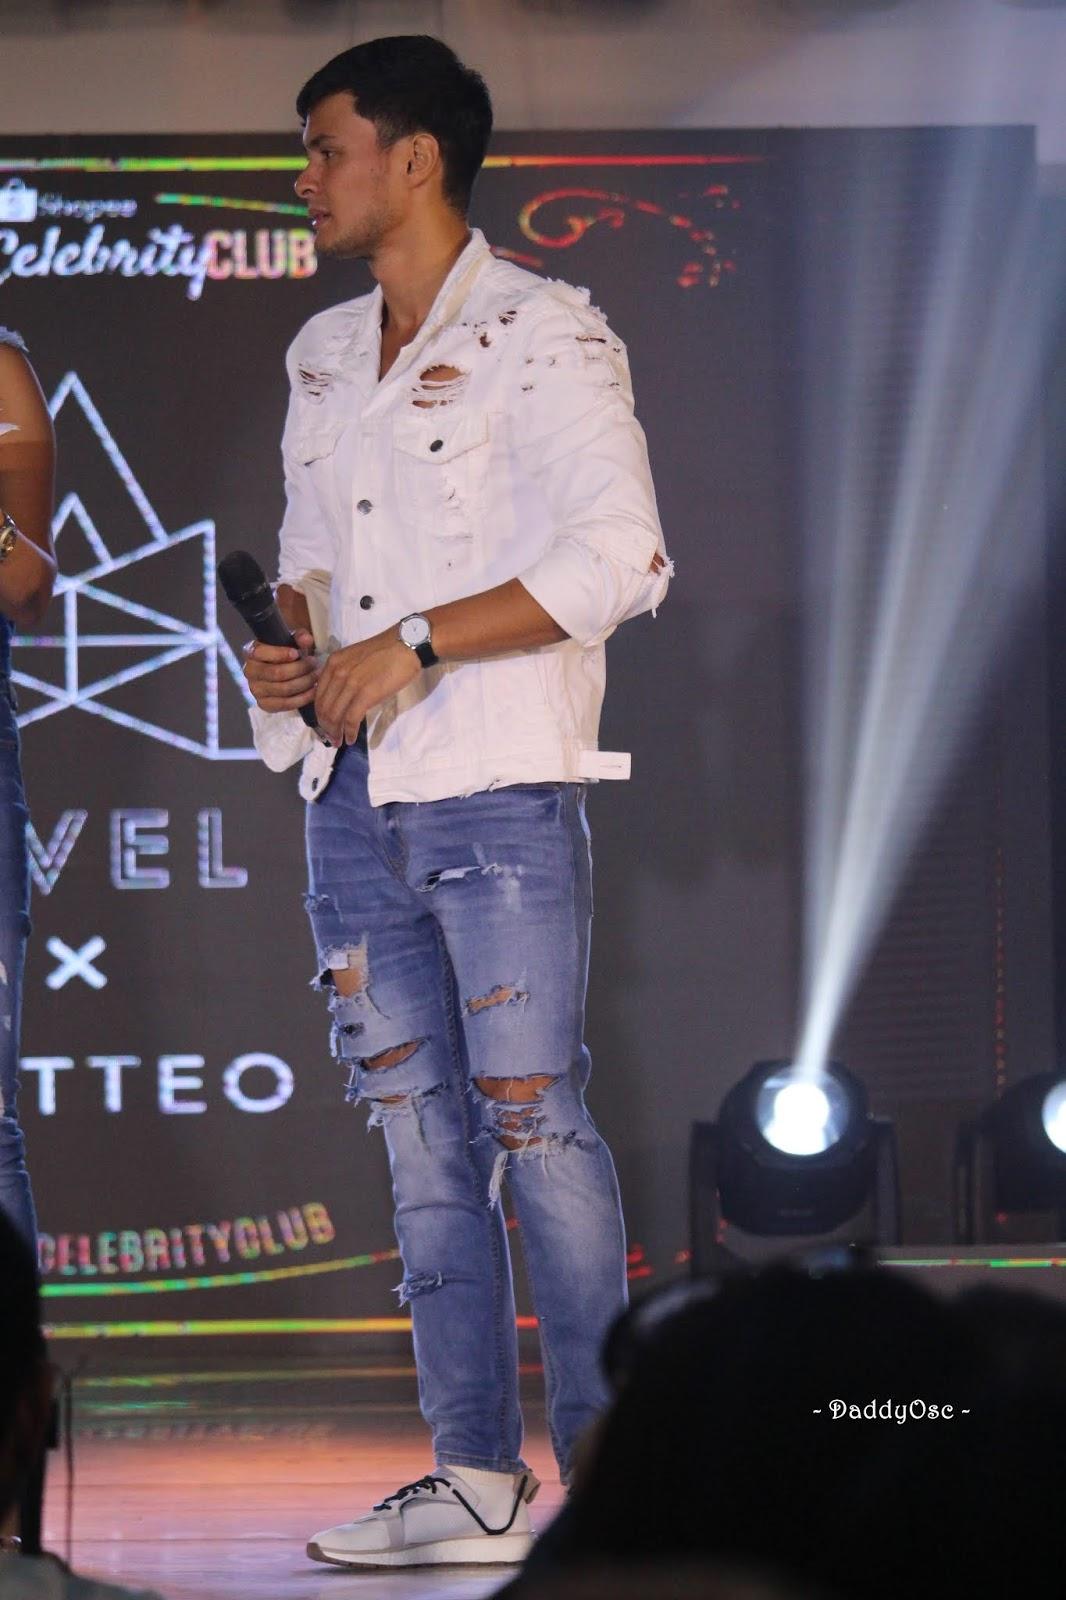 f06b27fcbdd12 Shopee Celebrity Club featuring Matteo Guidicelli for Avel x Matteo ...